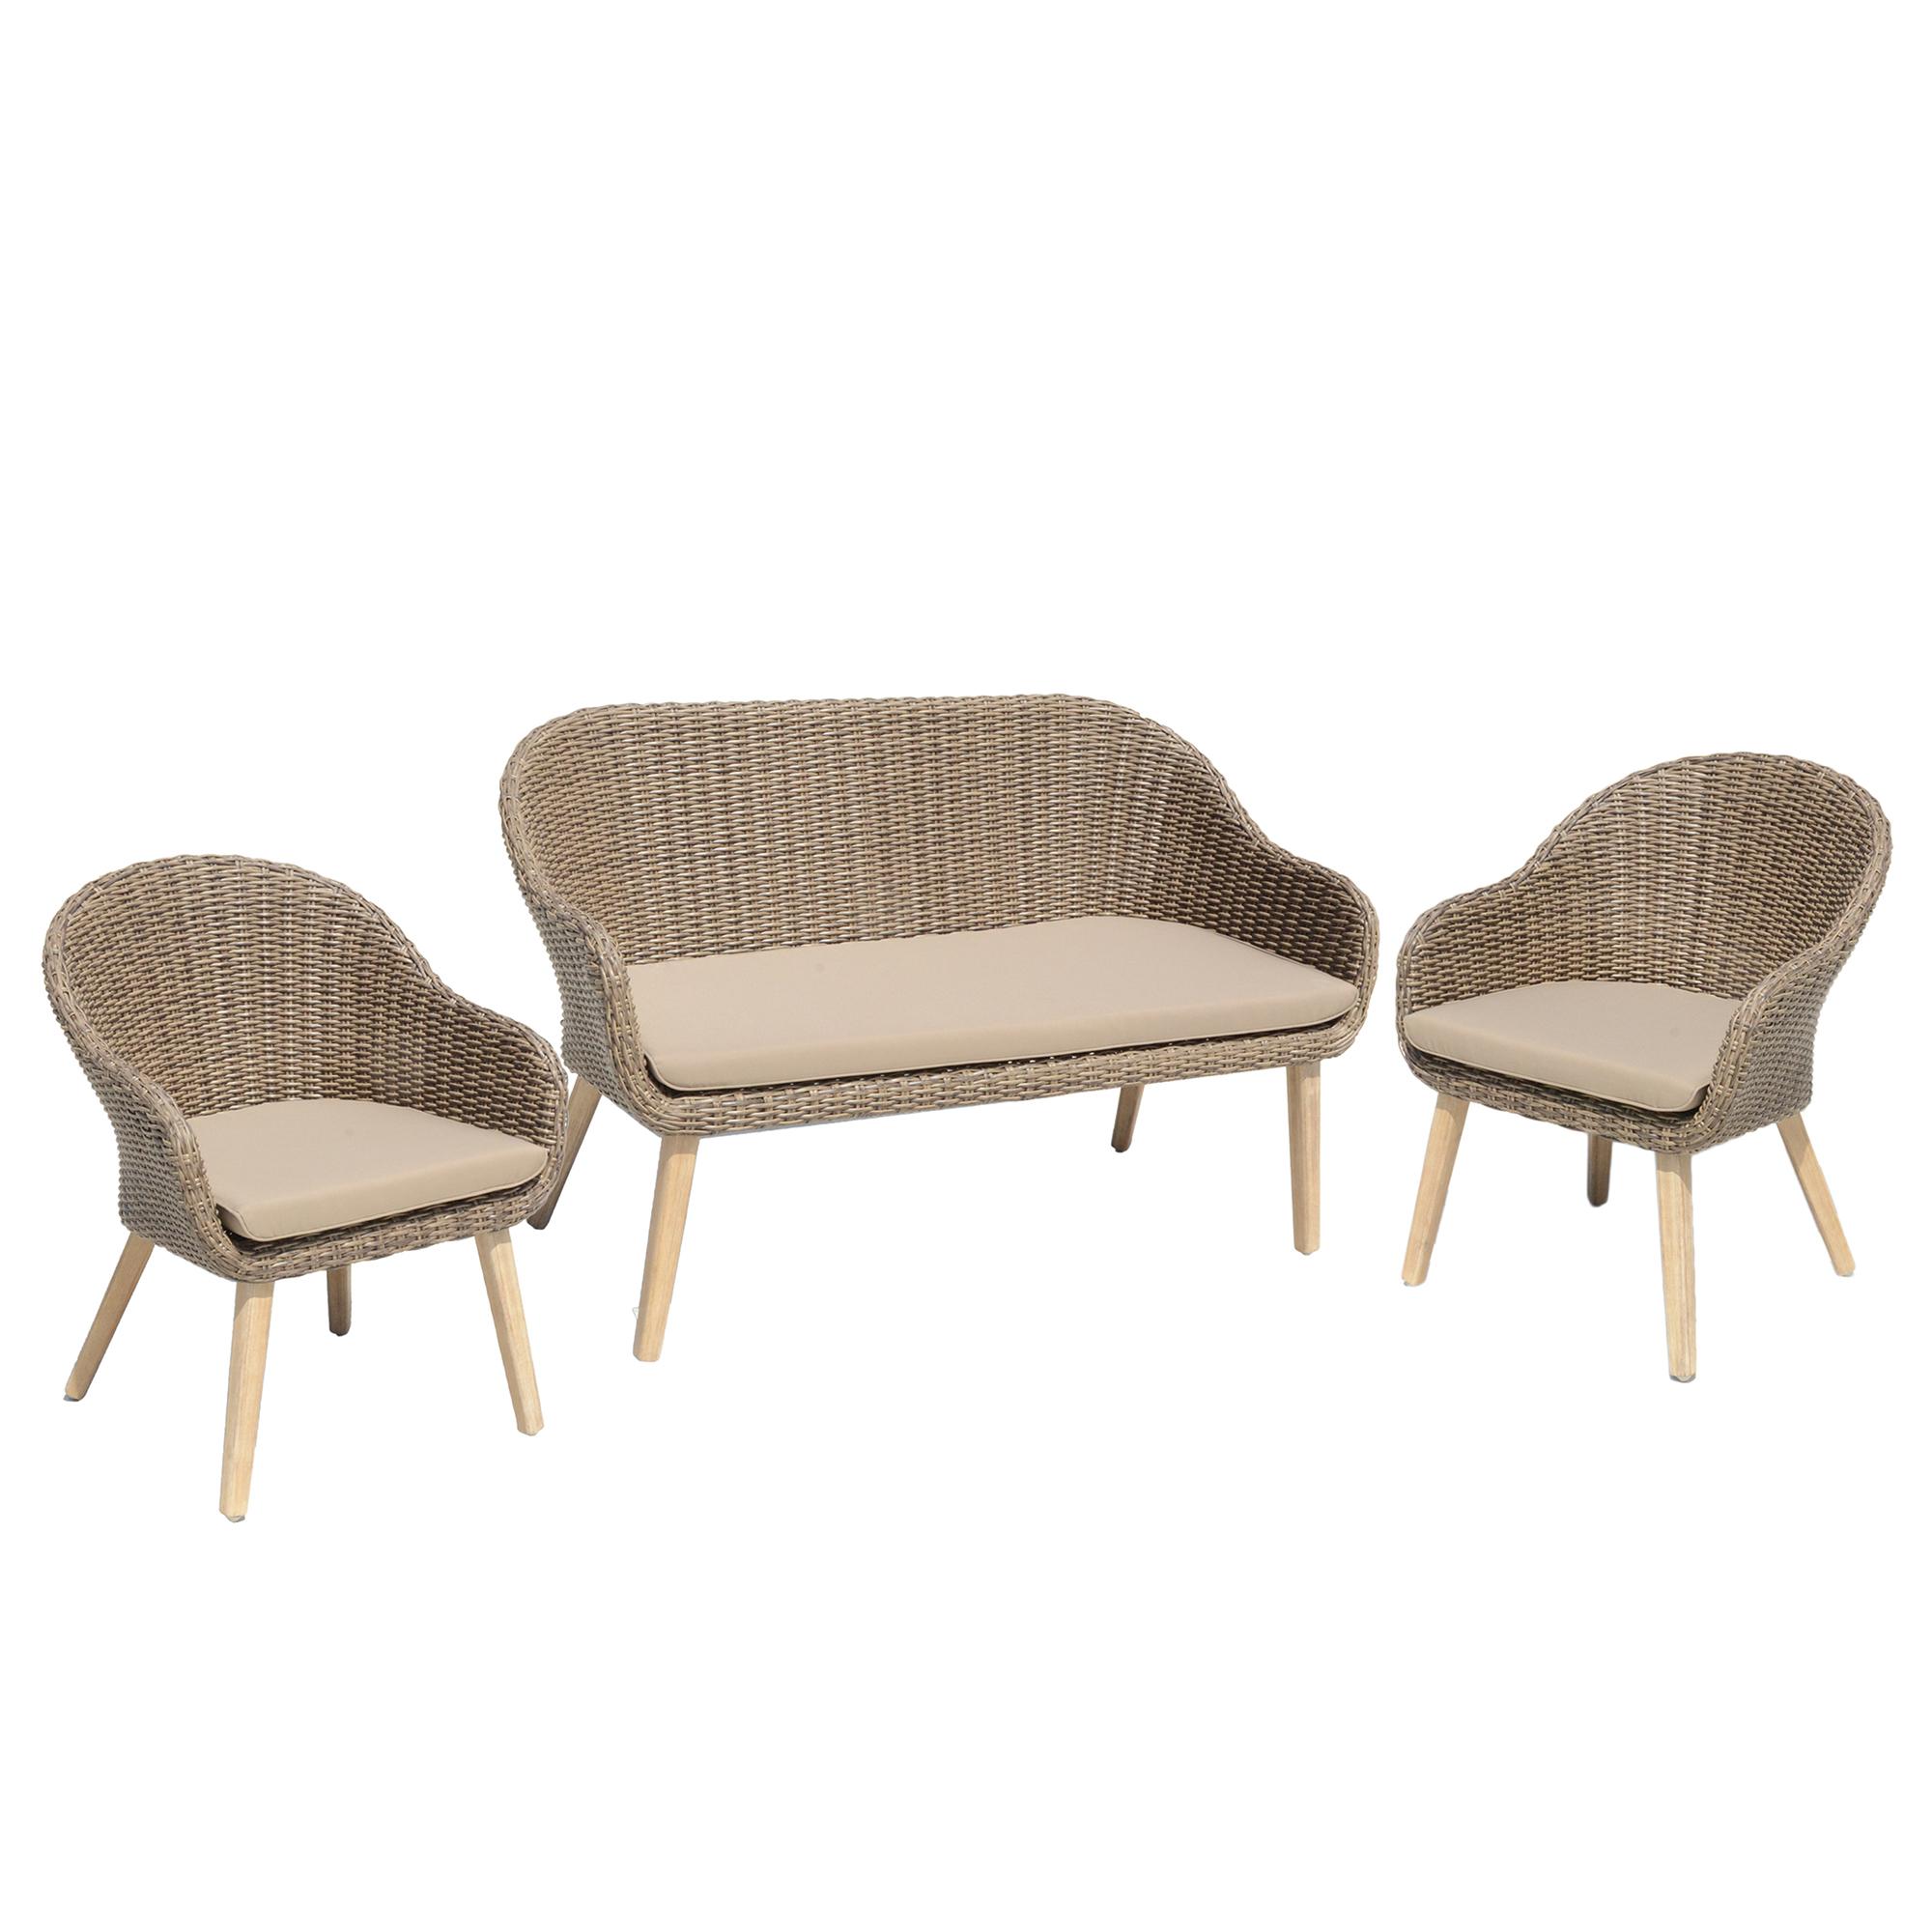 Gartenm Bel Set 4 Teilig Lounge Set Polyrattan Gartenset Sitzgruppe Garnitur Set